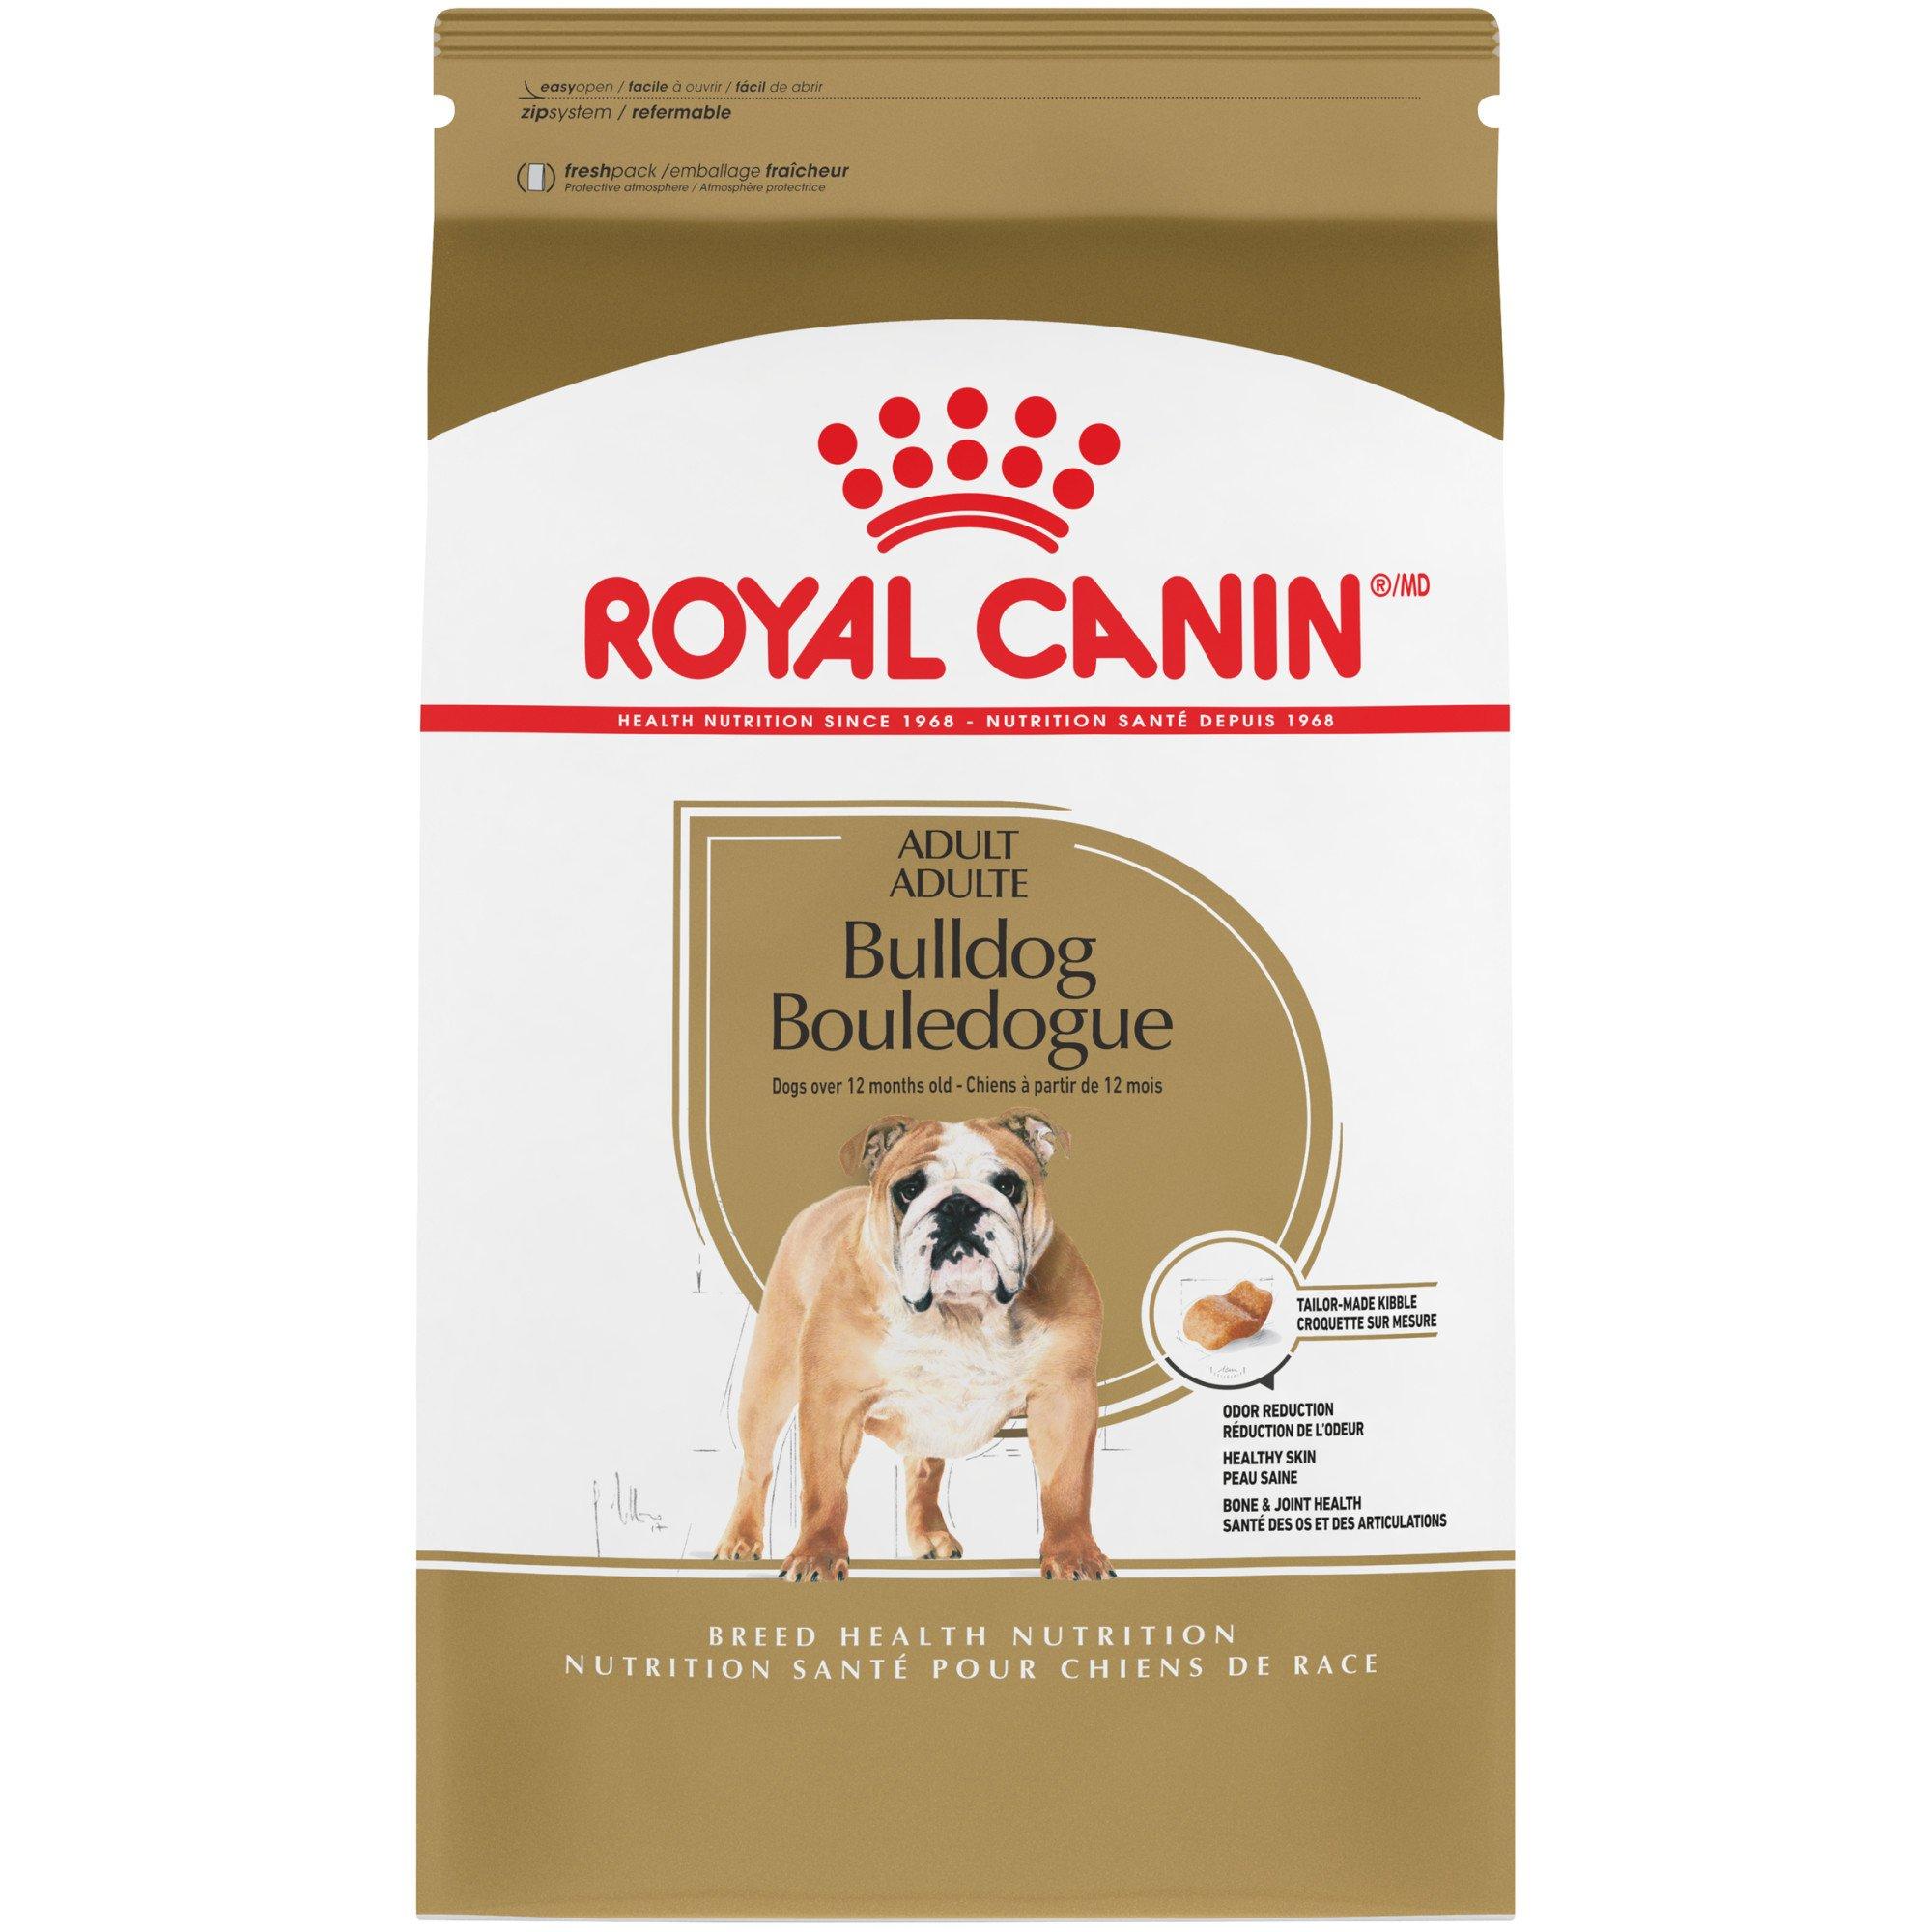 Royal Cannon Dog Food